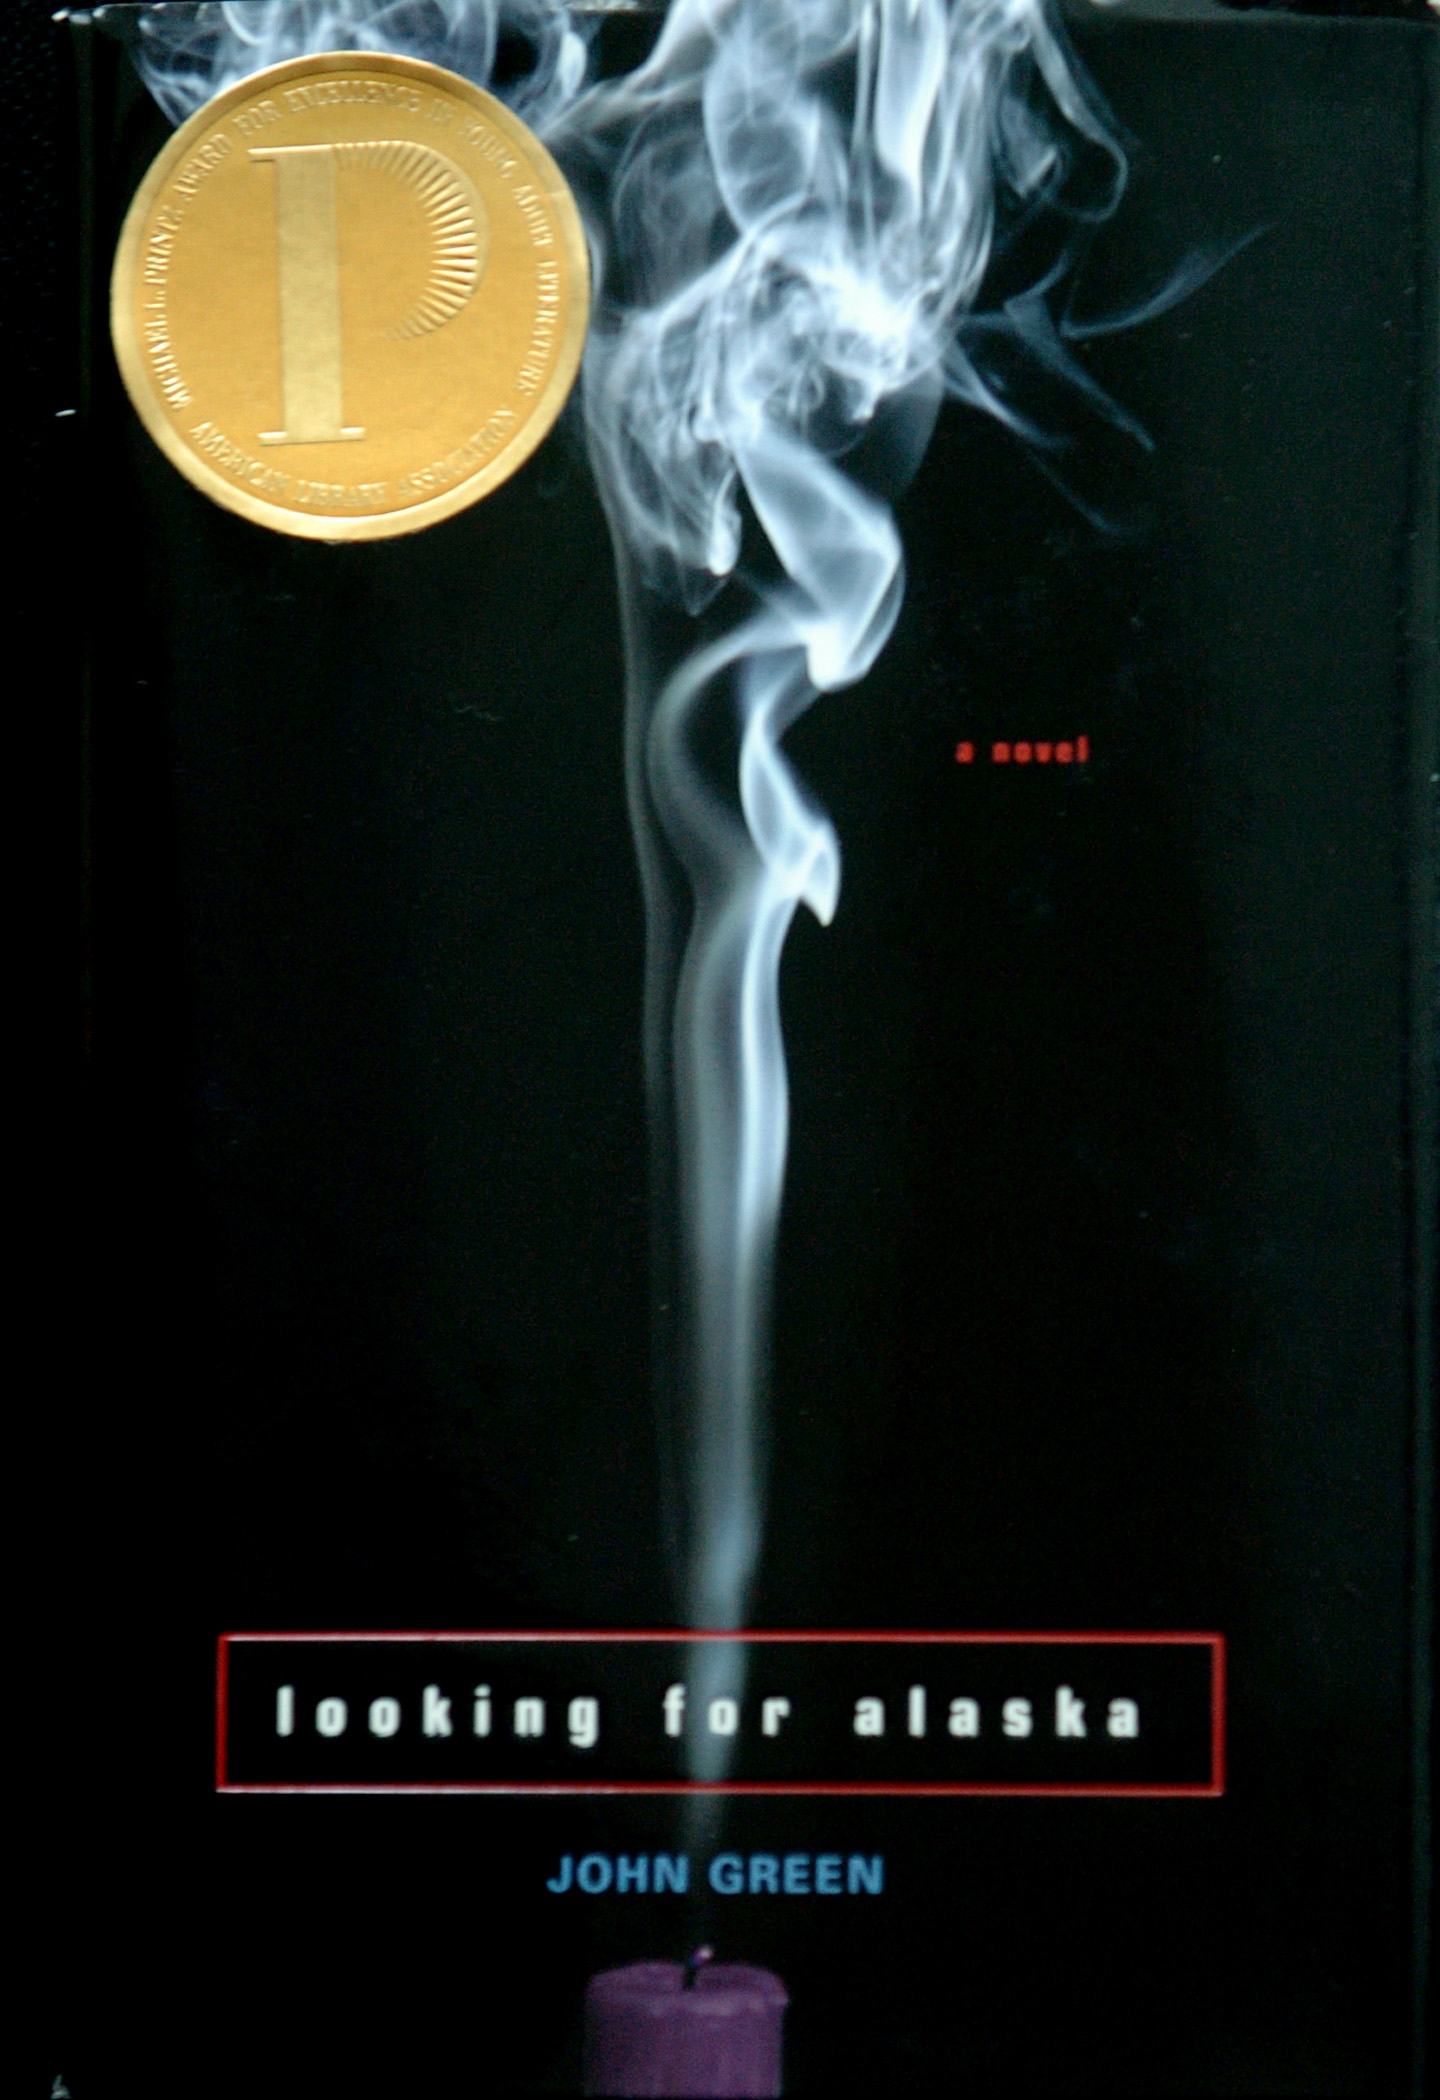 Read This: John Green Part 3, Looking for Alaska